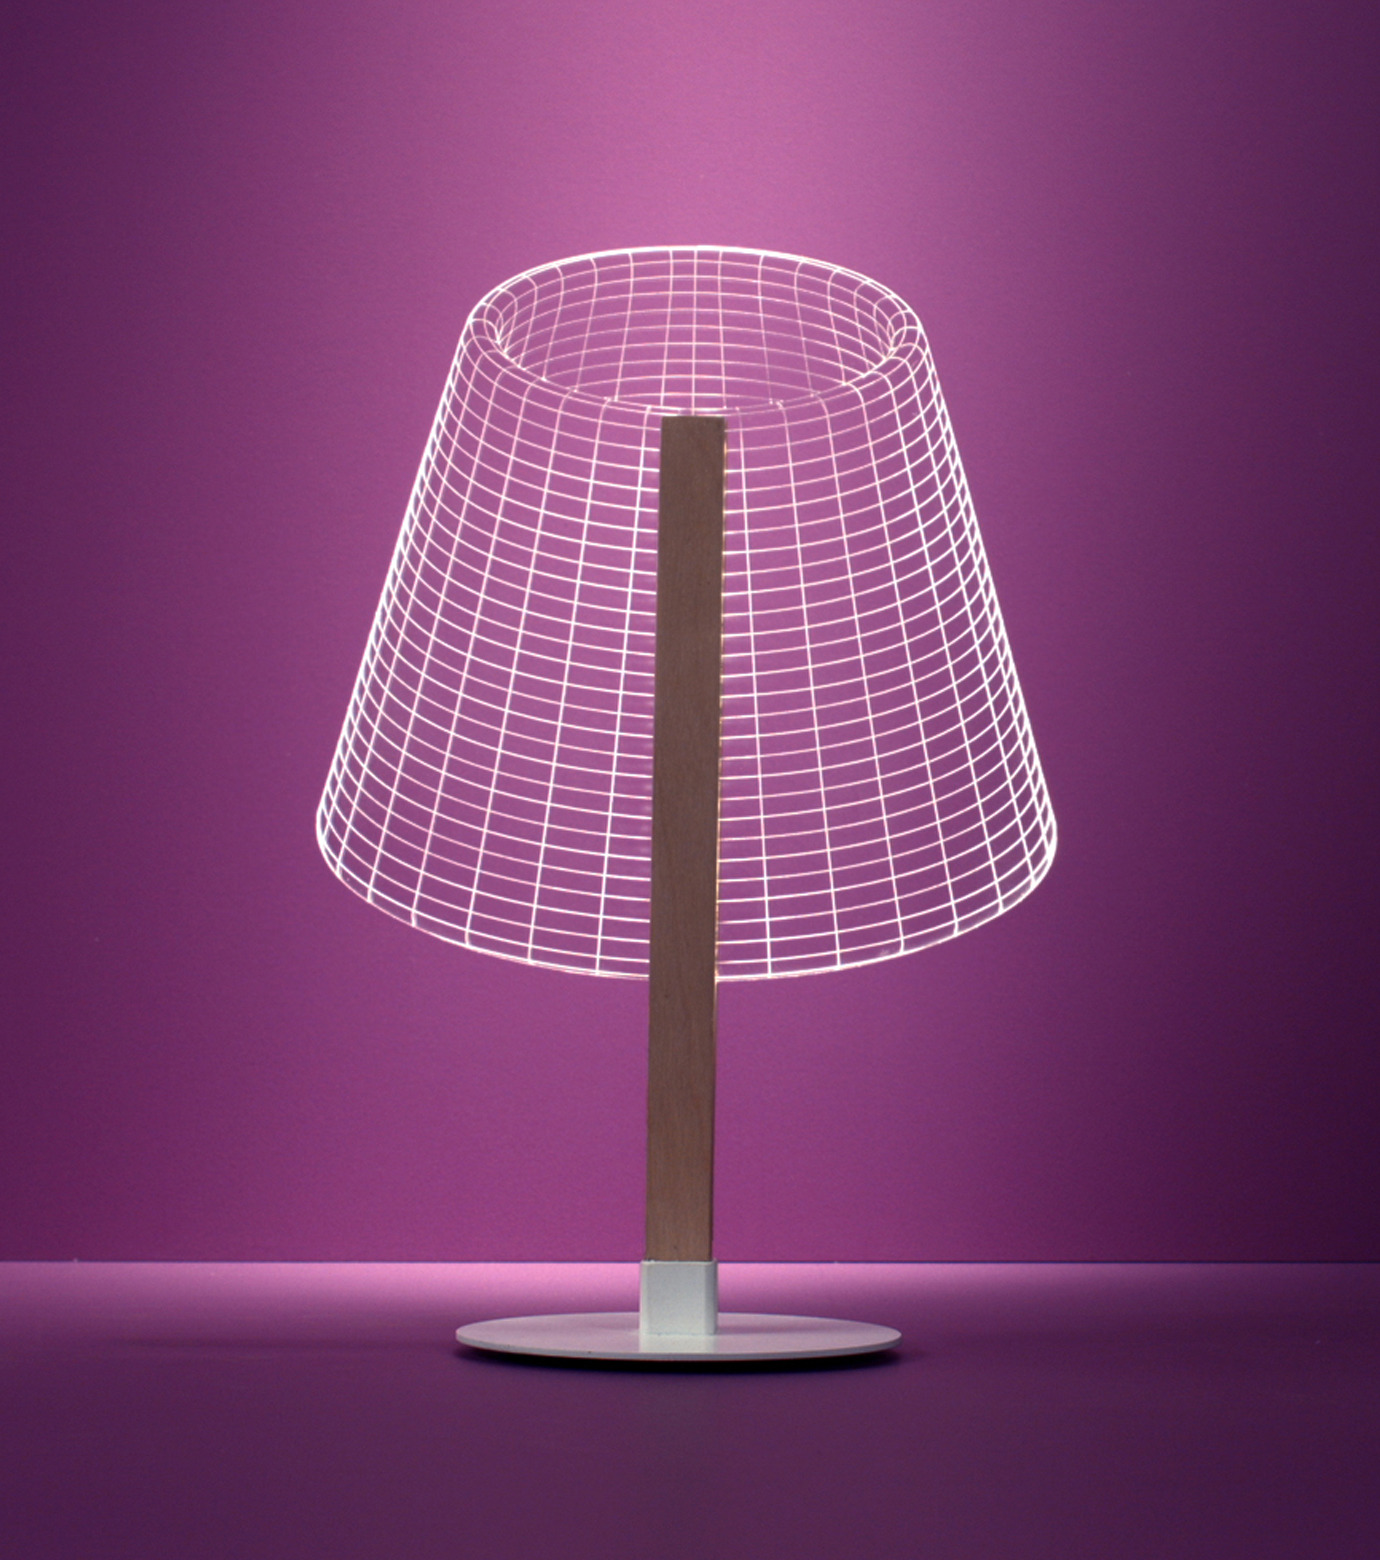 Bulbing(バルビング)のCLASSi-NONE(ライト/light)-480538-0 拡大詳細画像1